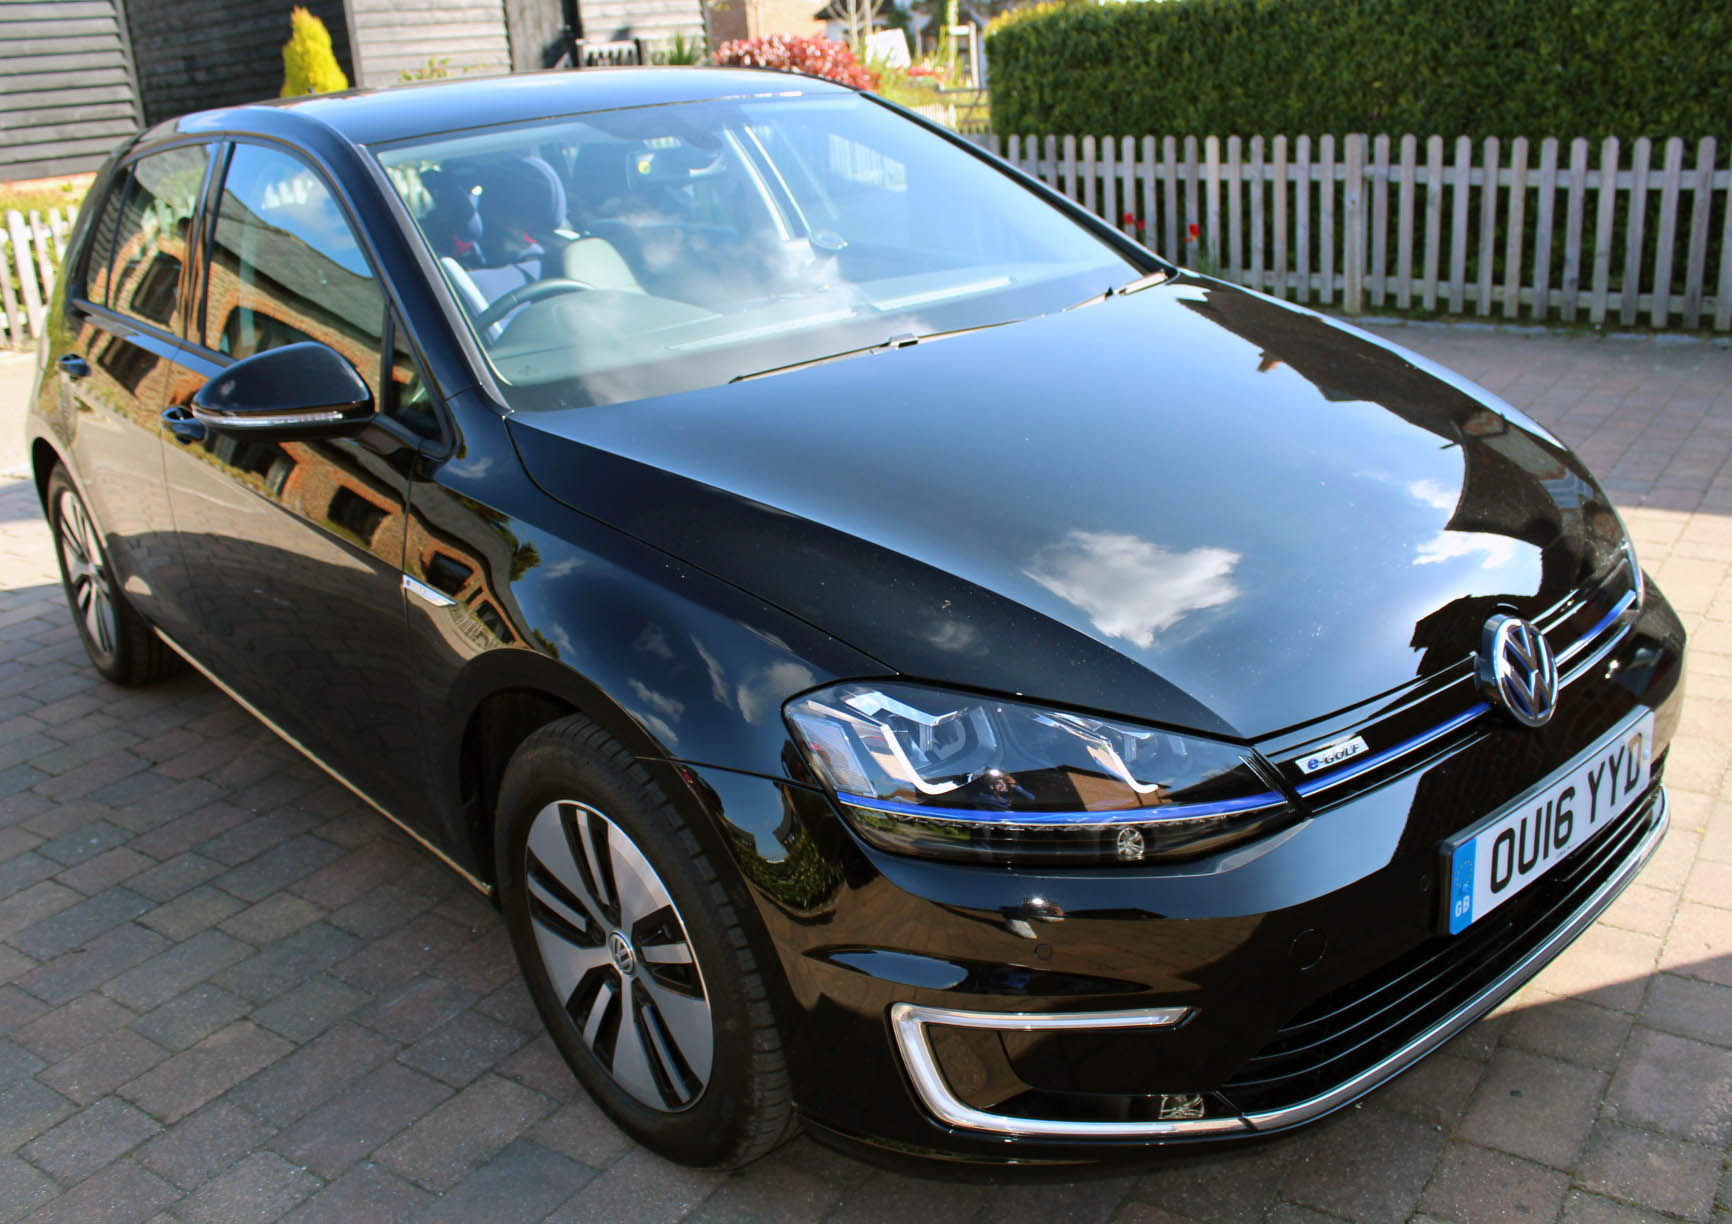 Volkswagen e-Golf, electric cars, VW e-Golf, dadbloguk, dadbloguk.com, EVr Go Electric